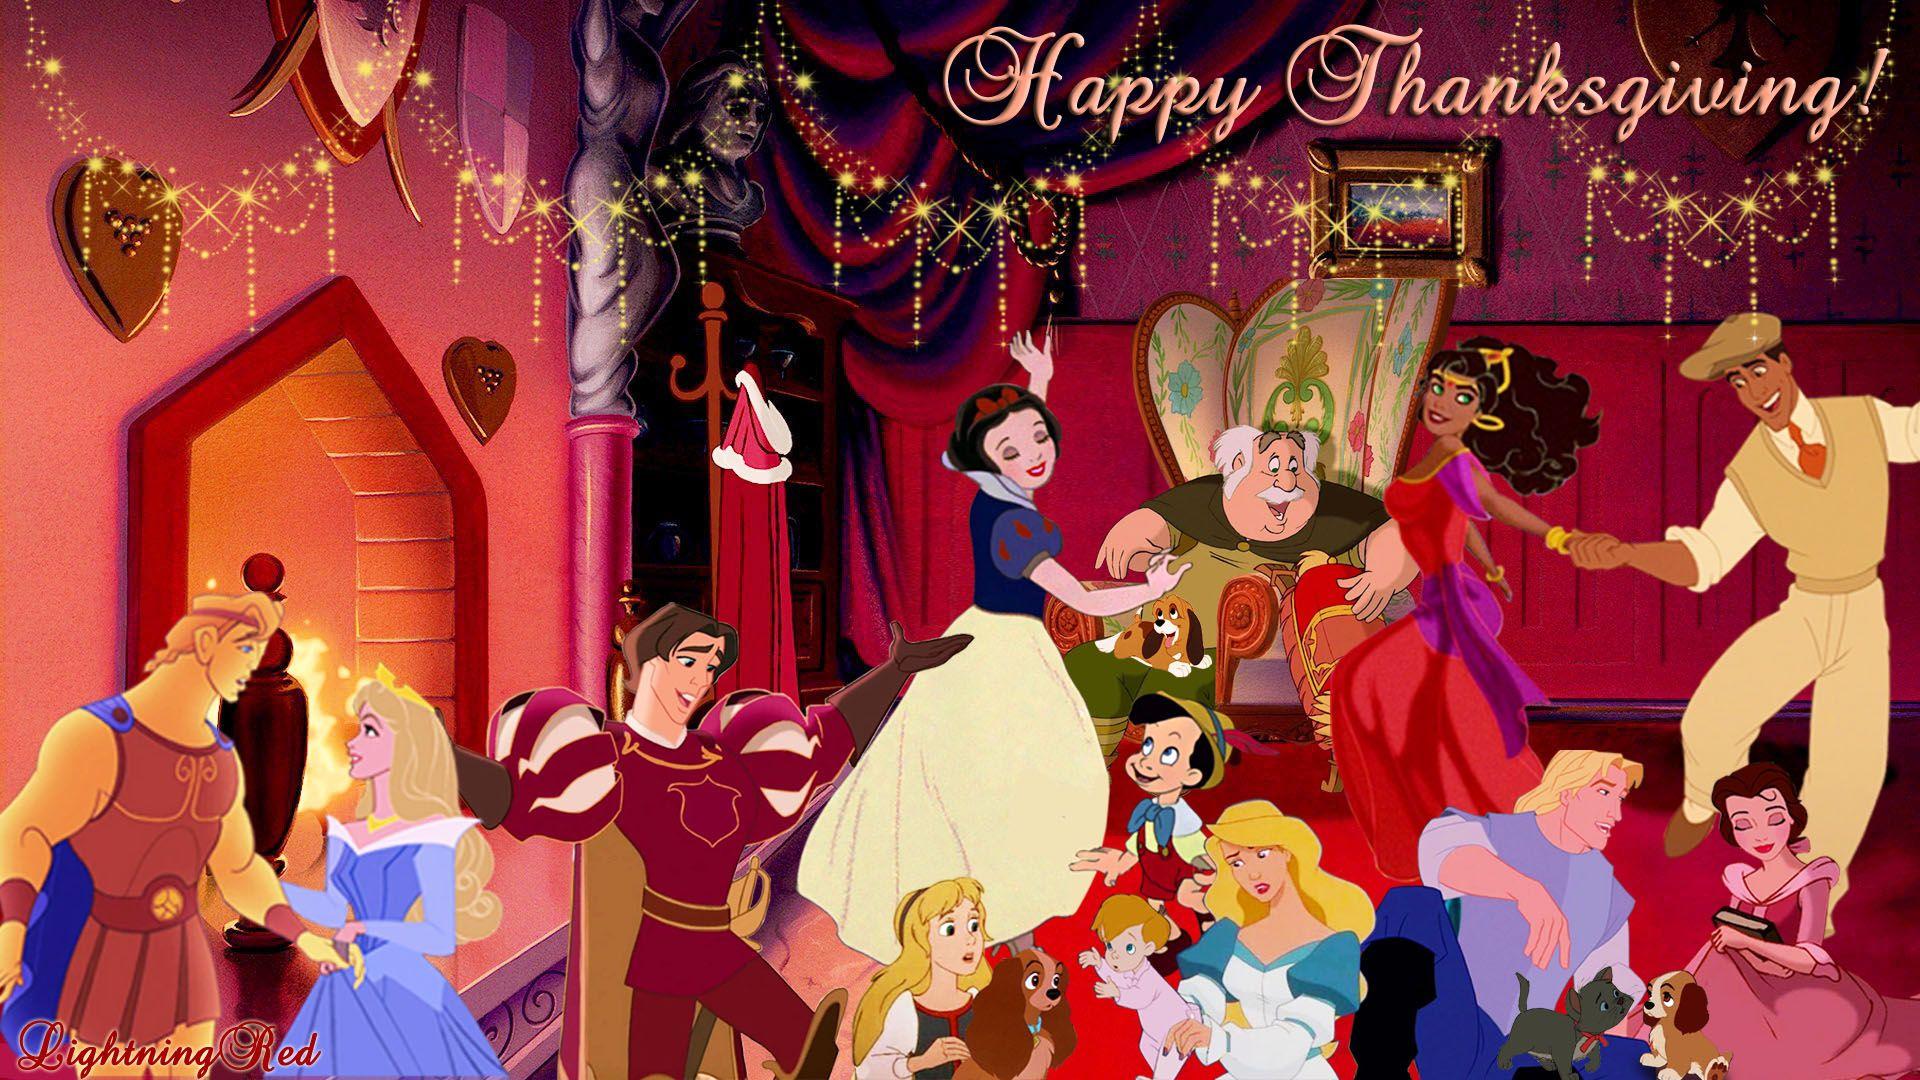 Thanksgiving-Gathering-disney-crossover-32845743-1920-1080 ...